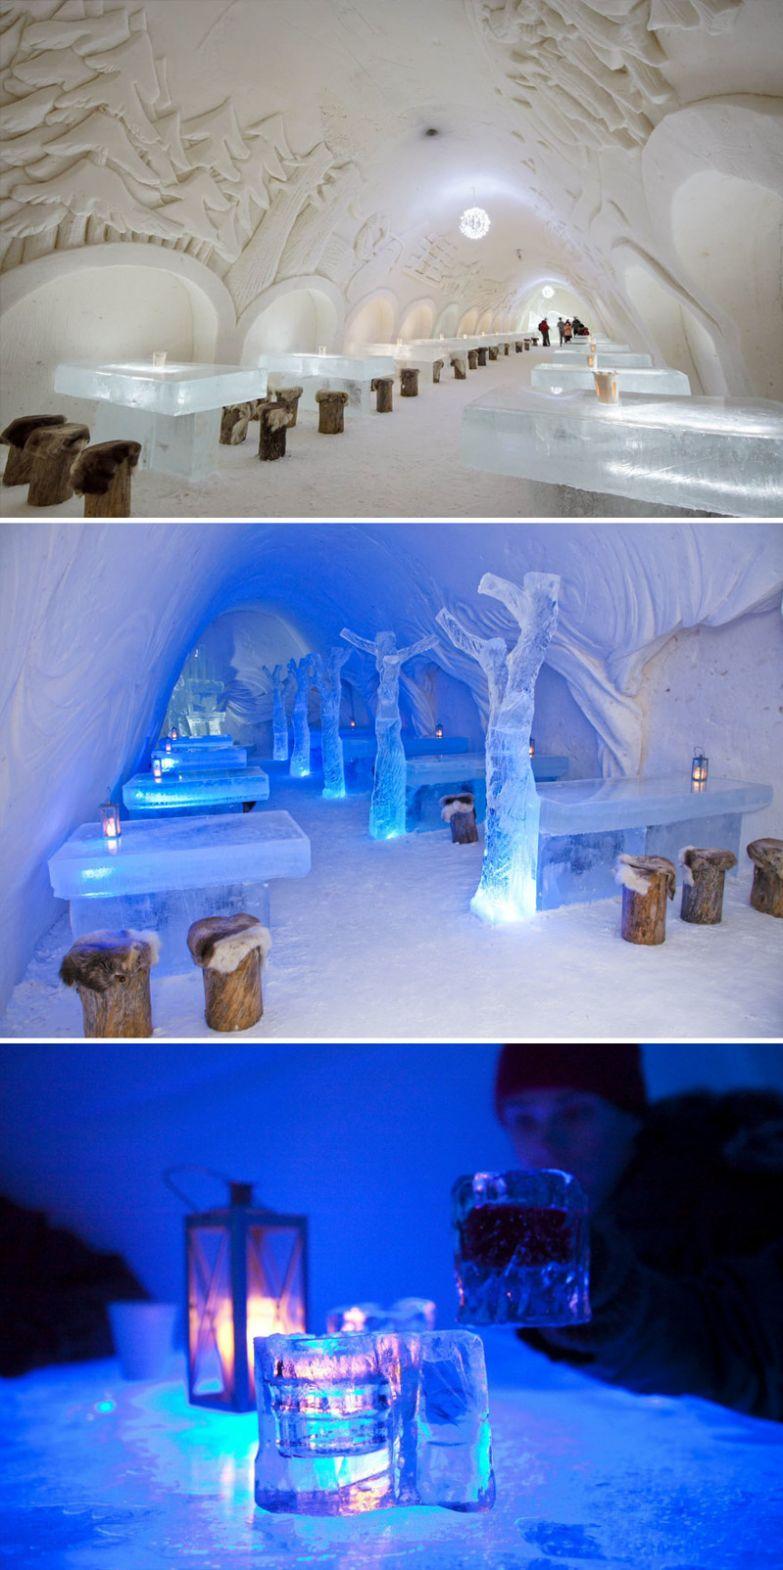 Снежный ресторан The Snowcastle Of Kemi, Кеми, Финляндия мир, подборка, ресторан